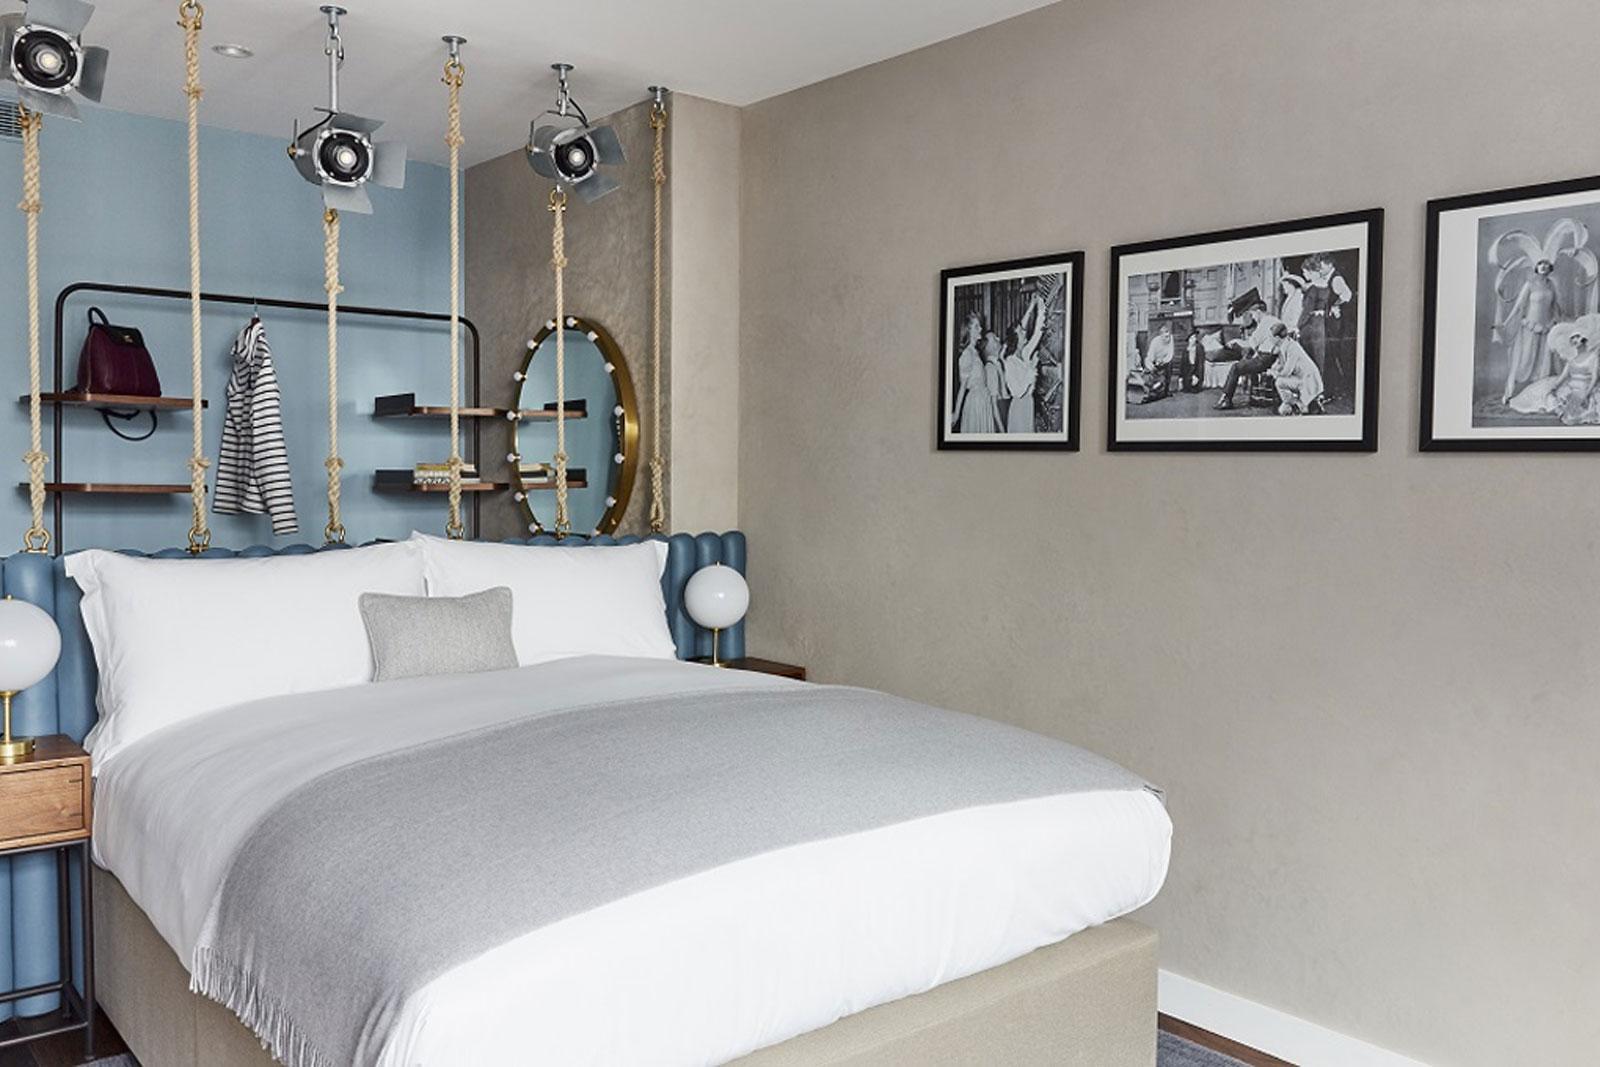 Indigo Art Hotel Indigo, Leicester Square